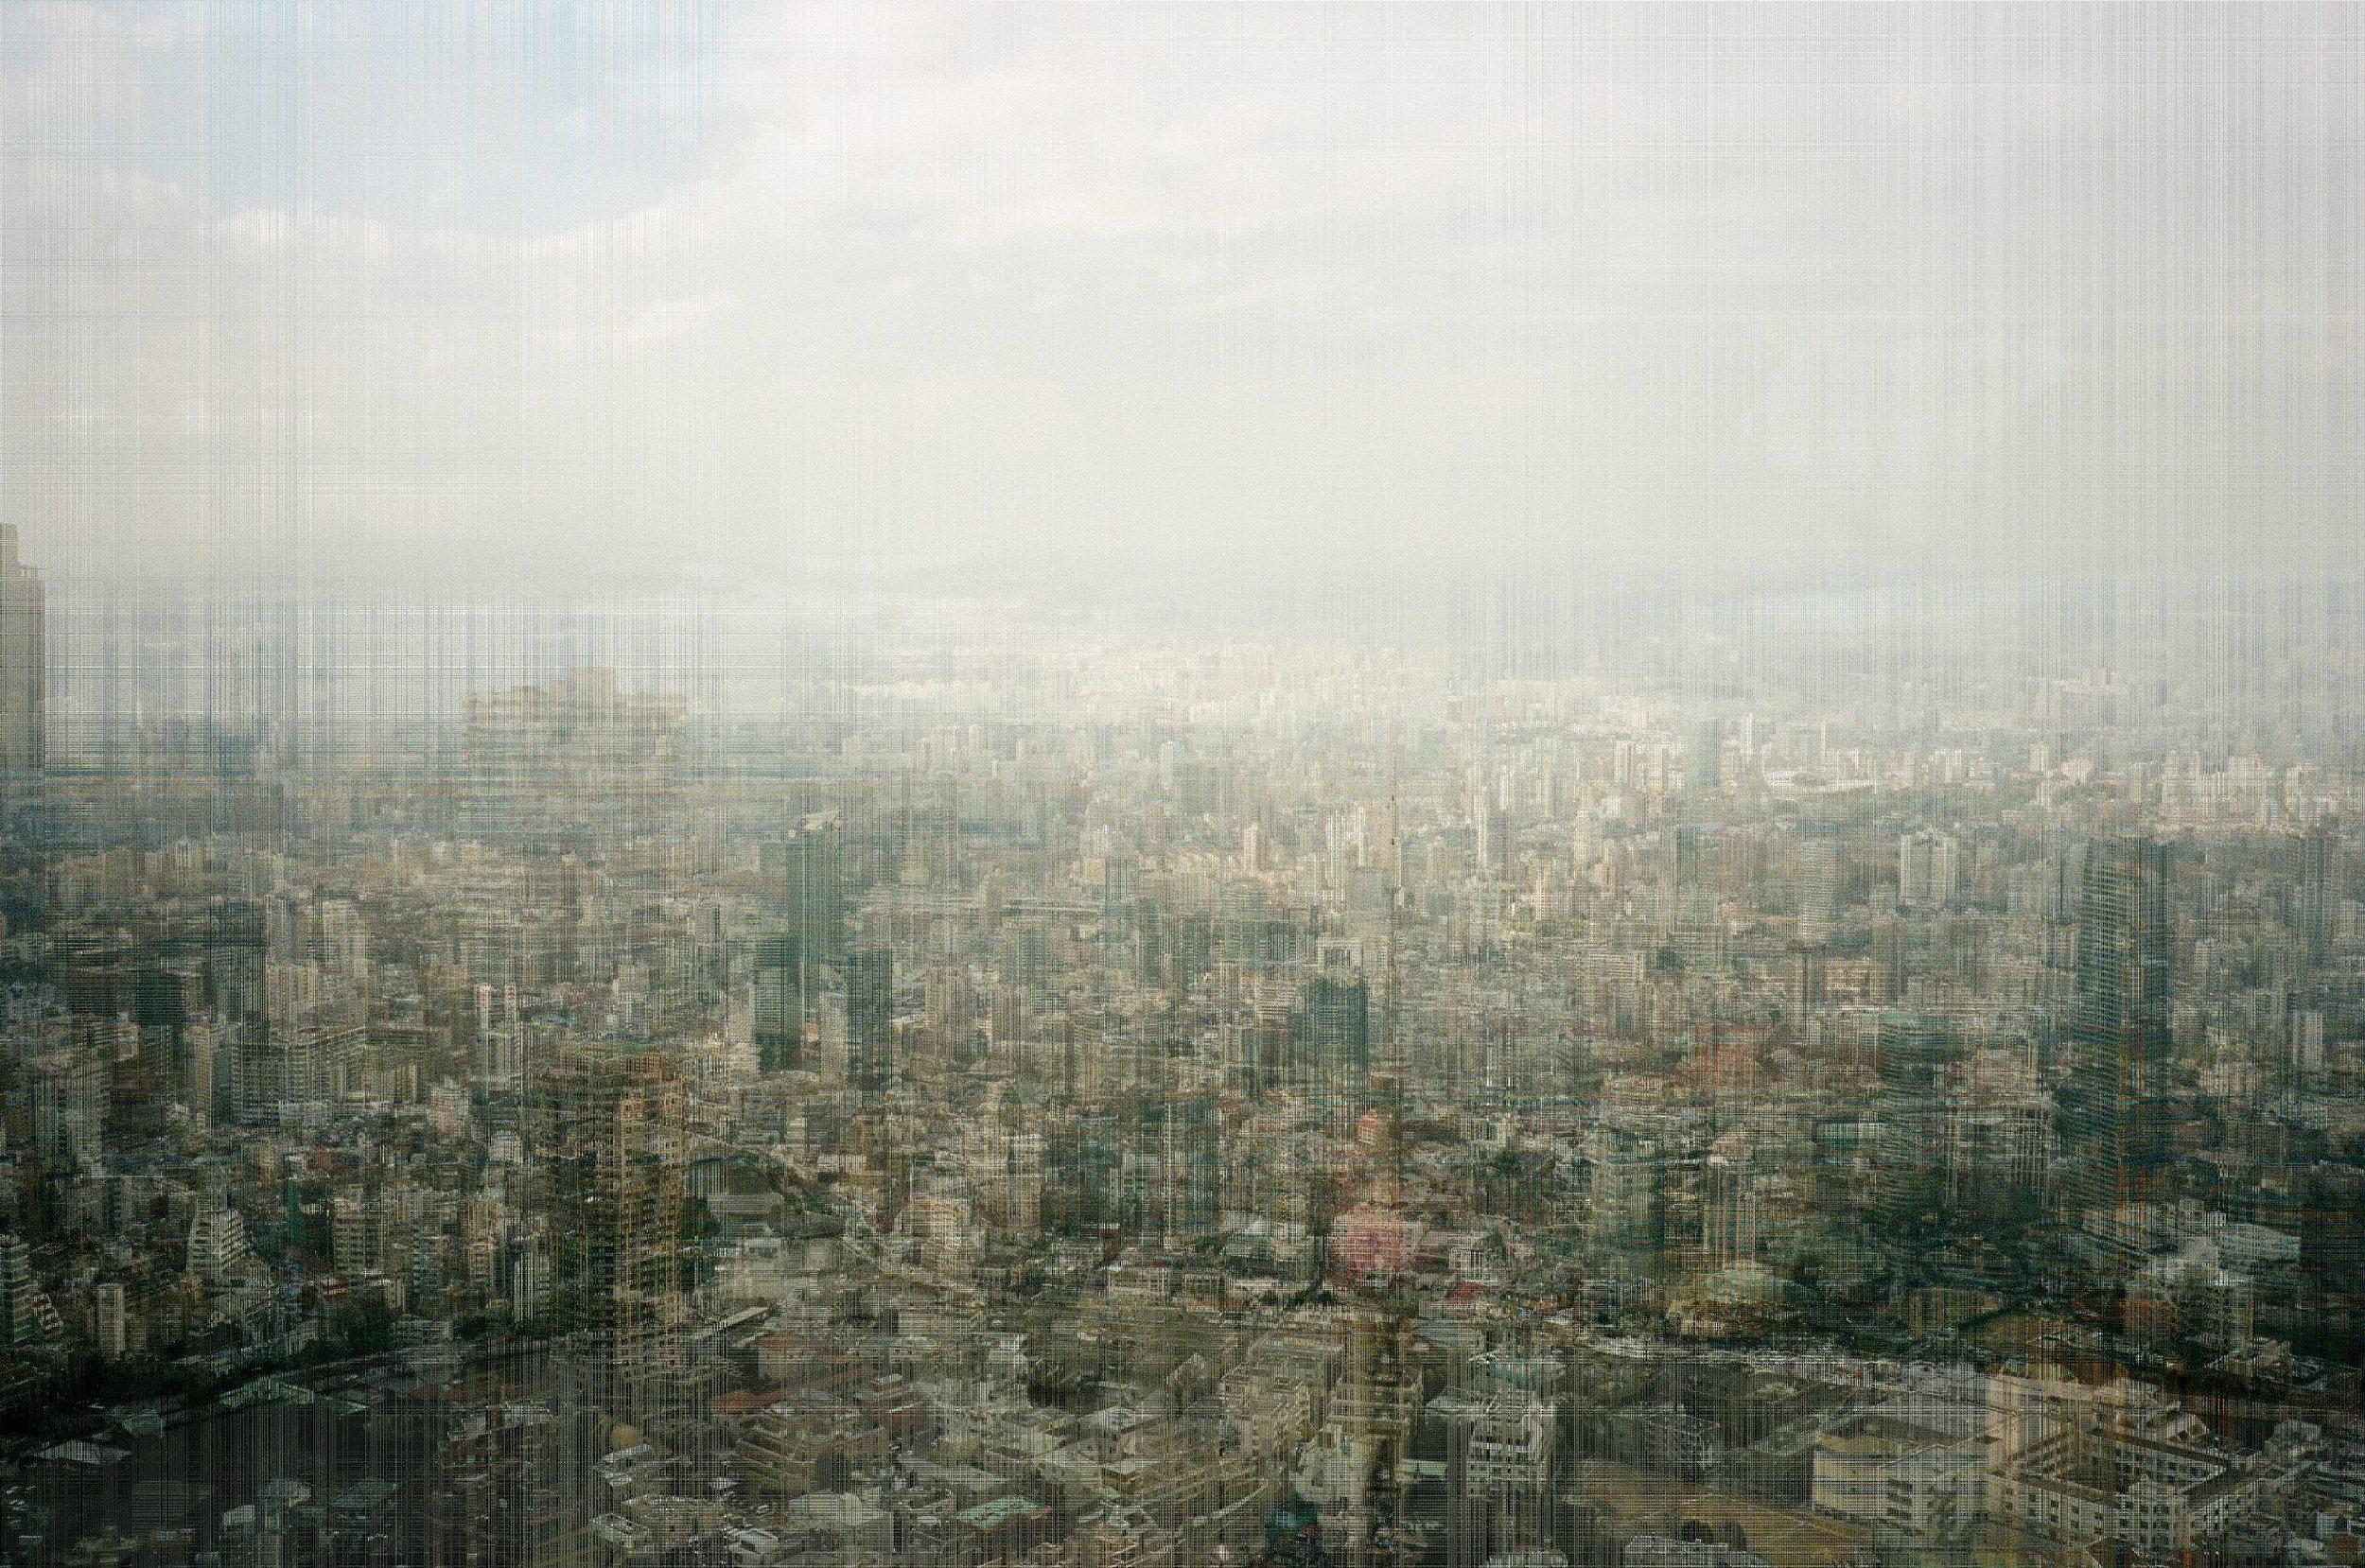 Utopia_i_004.jpg